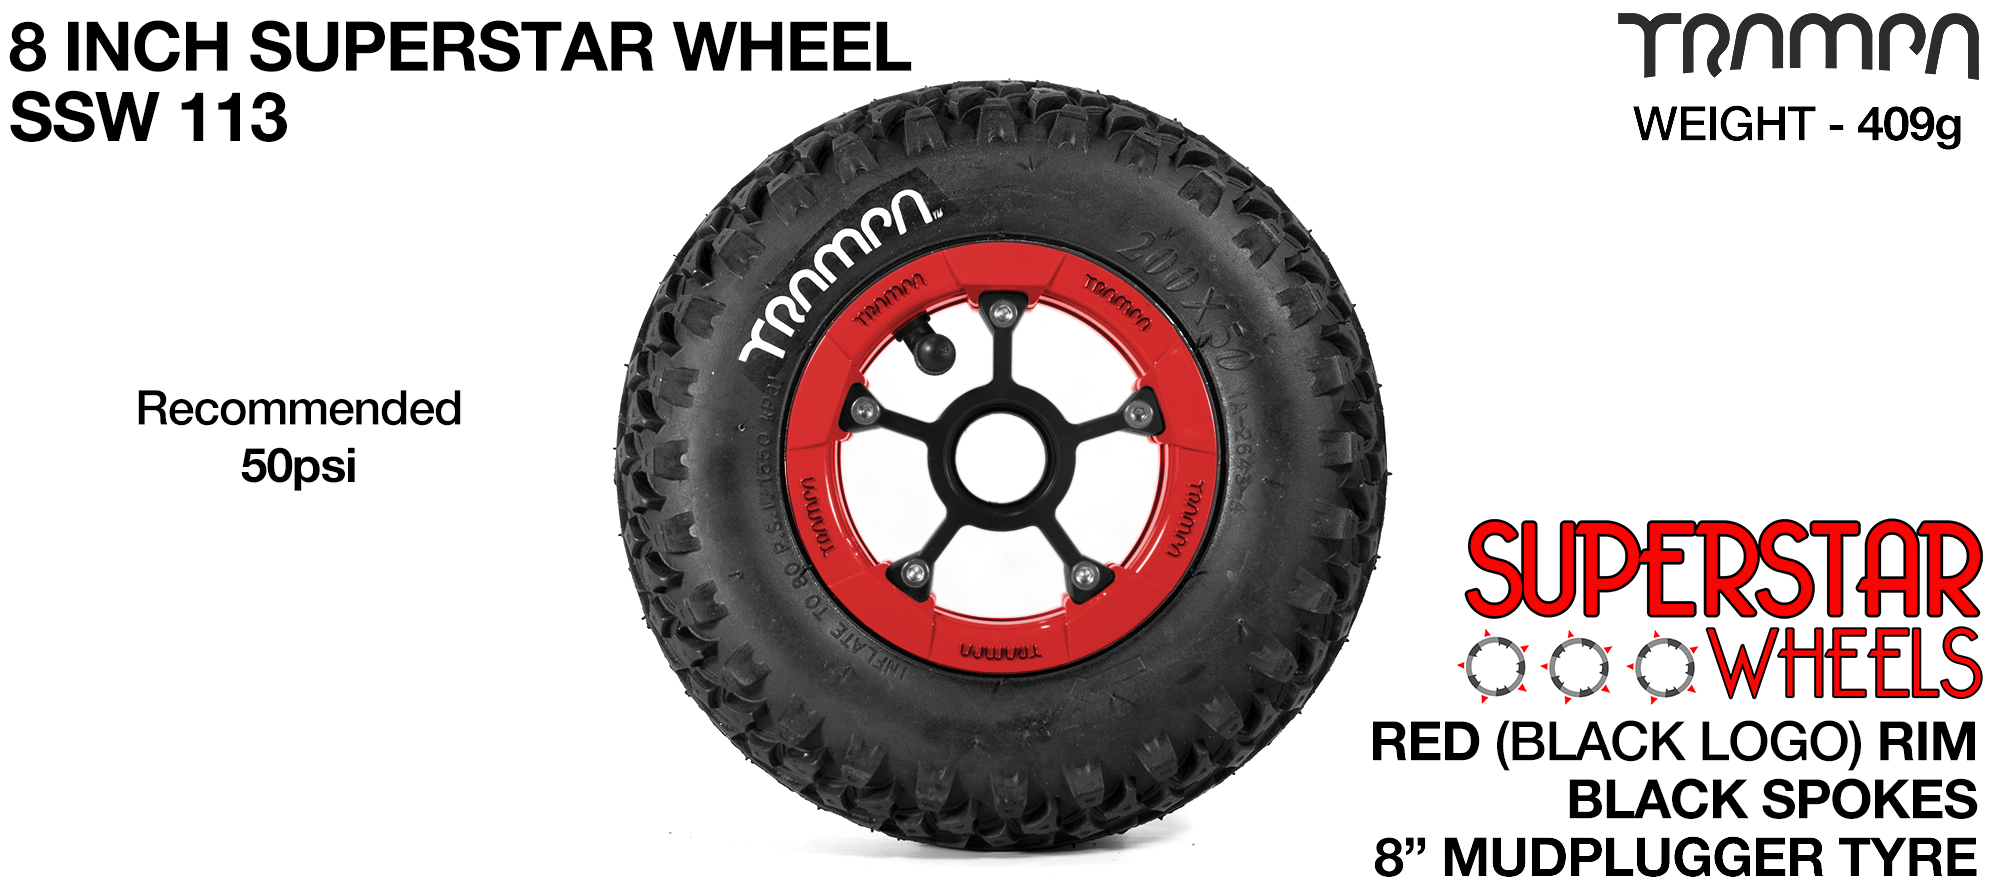 Superstar 8 inch wheels -  Red & Black Logo Rim Black Anodised spokes & Black MudPlugger 8 inch Tyre